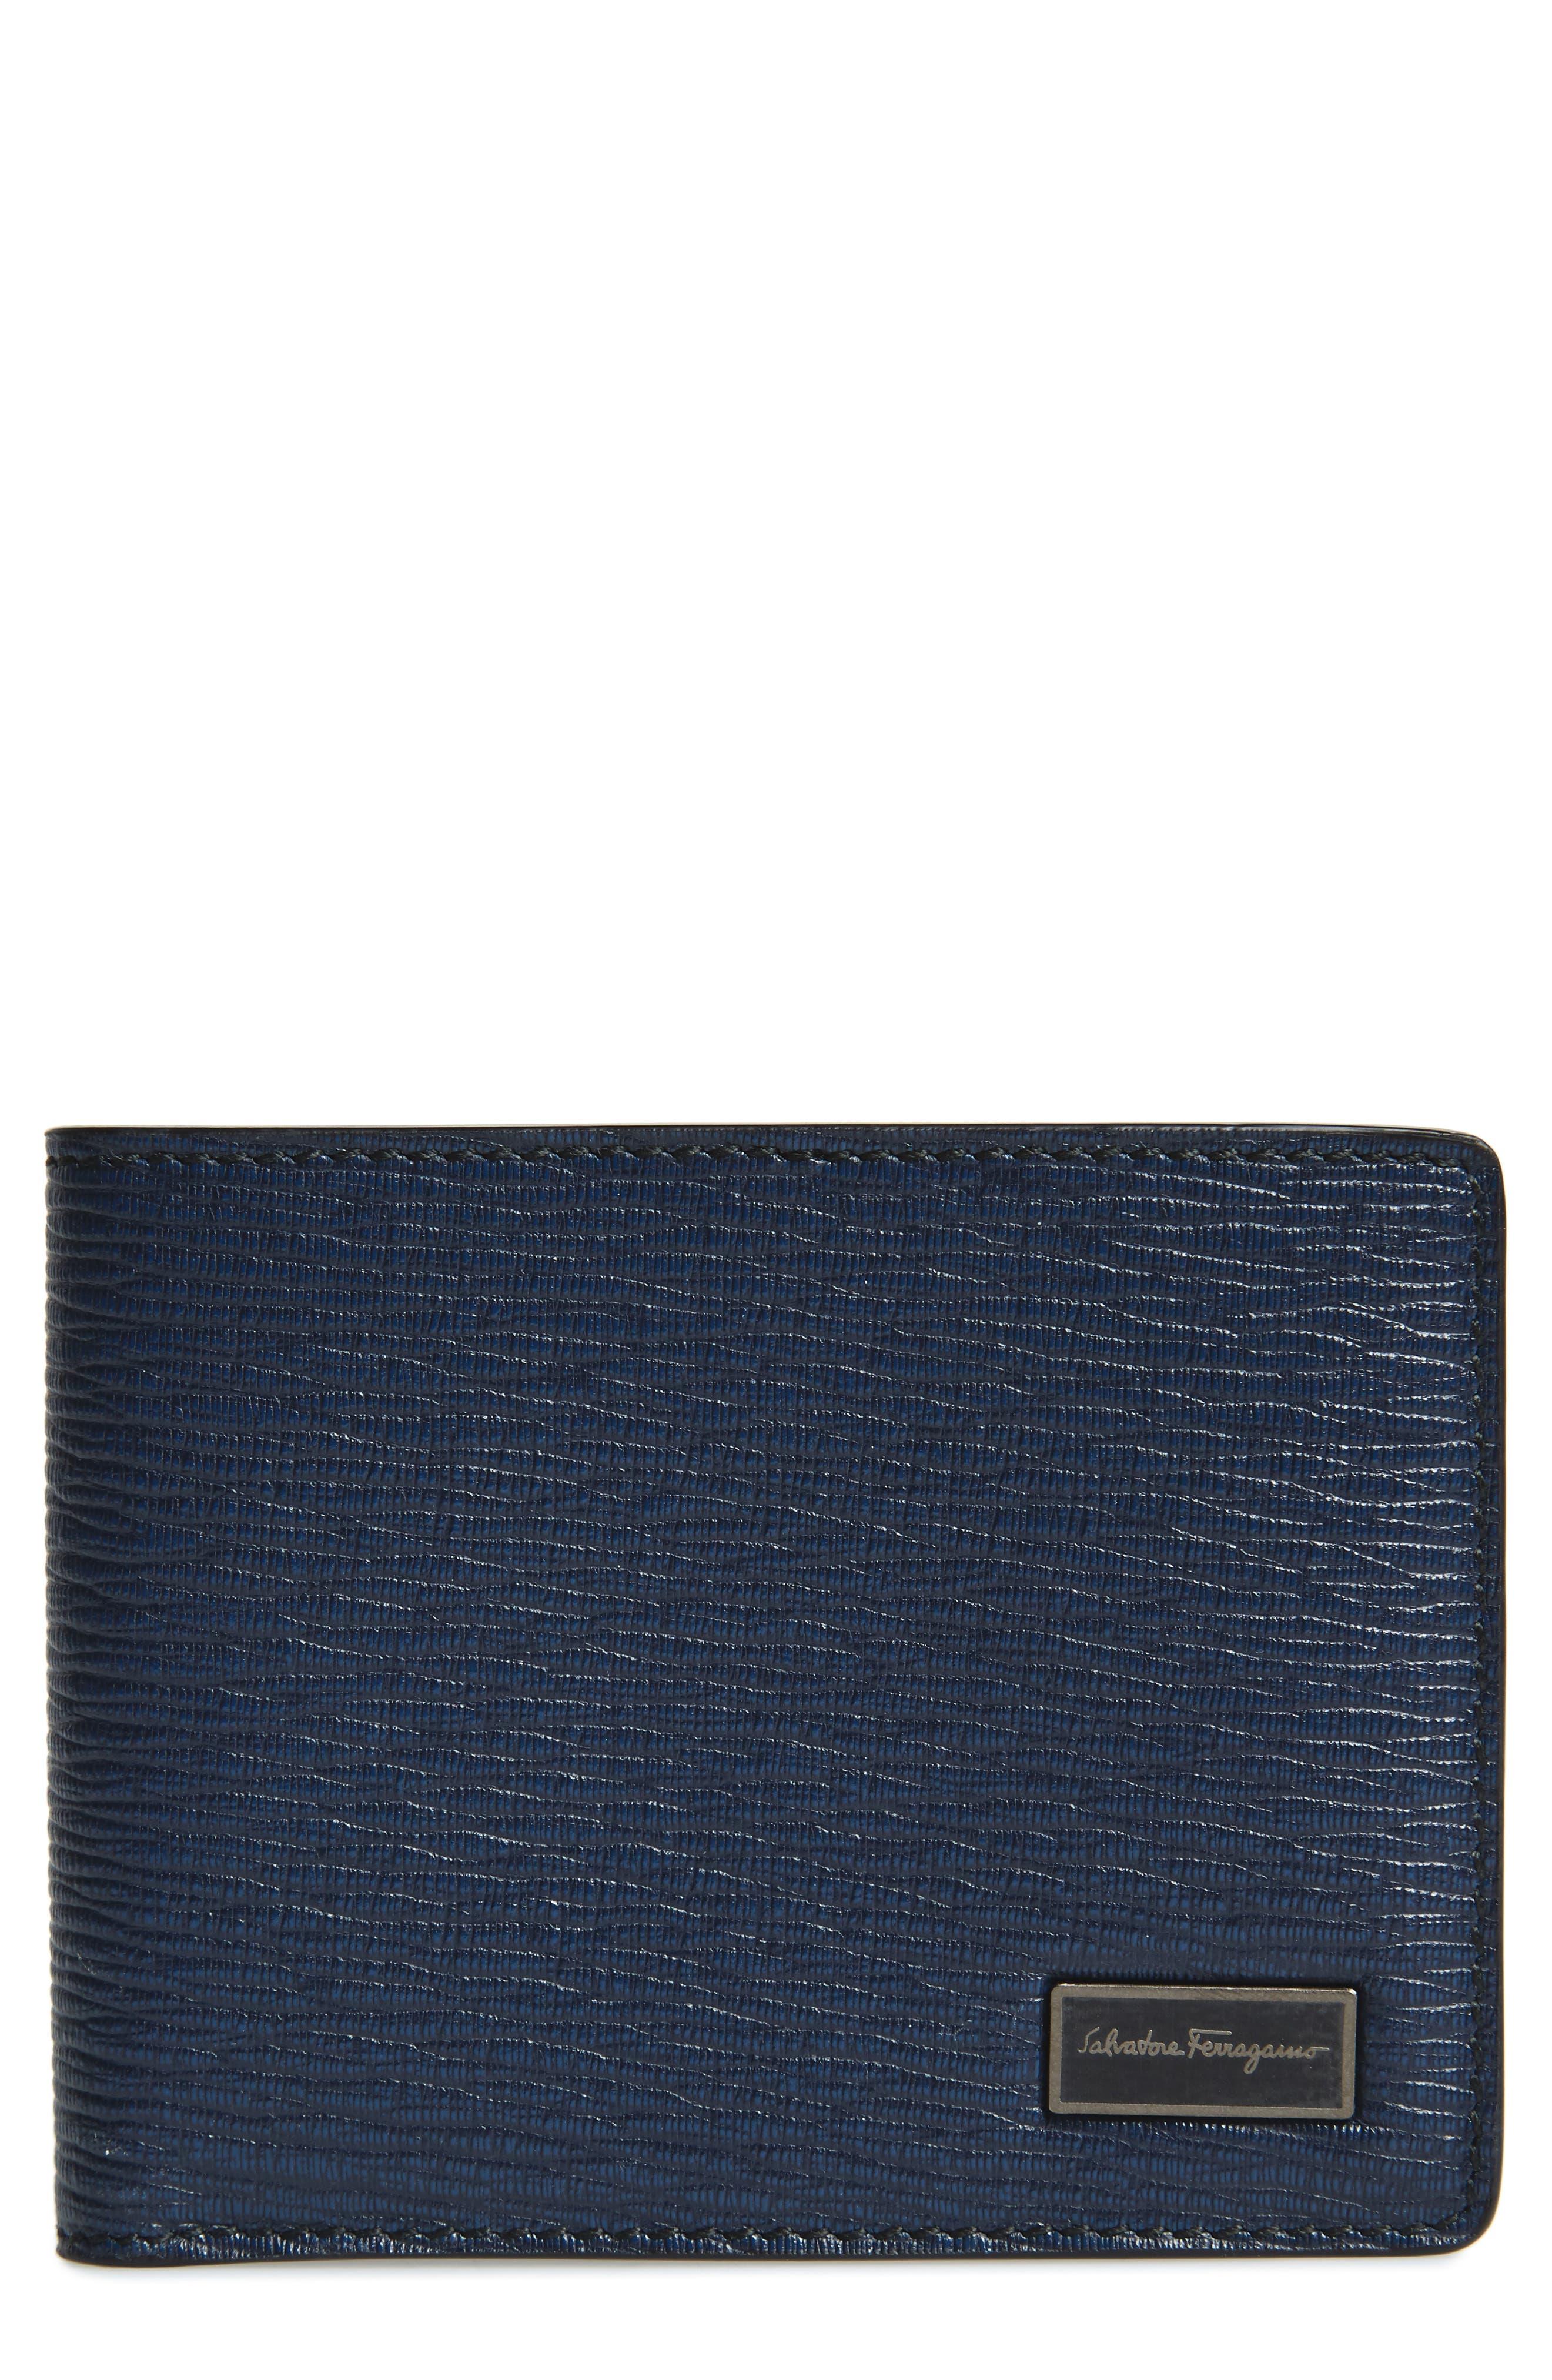 Main Image - Salvatore Ferragamo Revival Leather Wallet